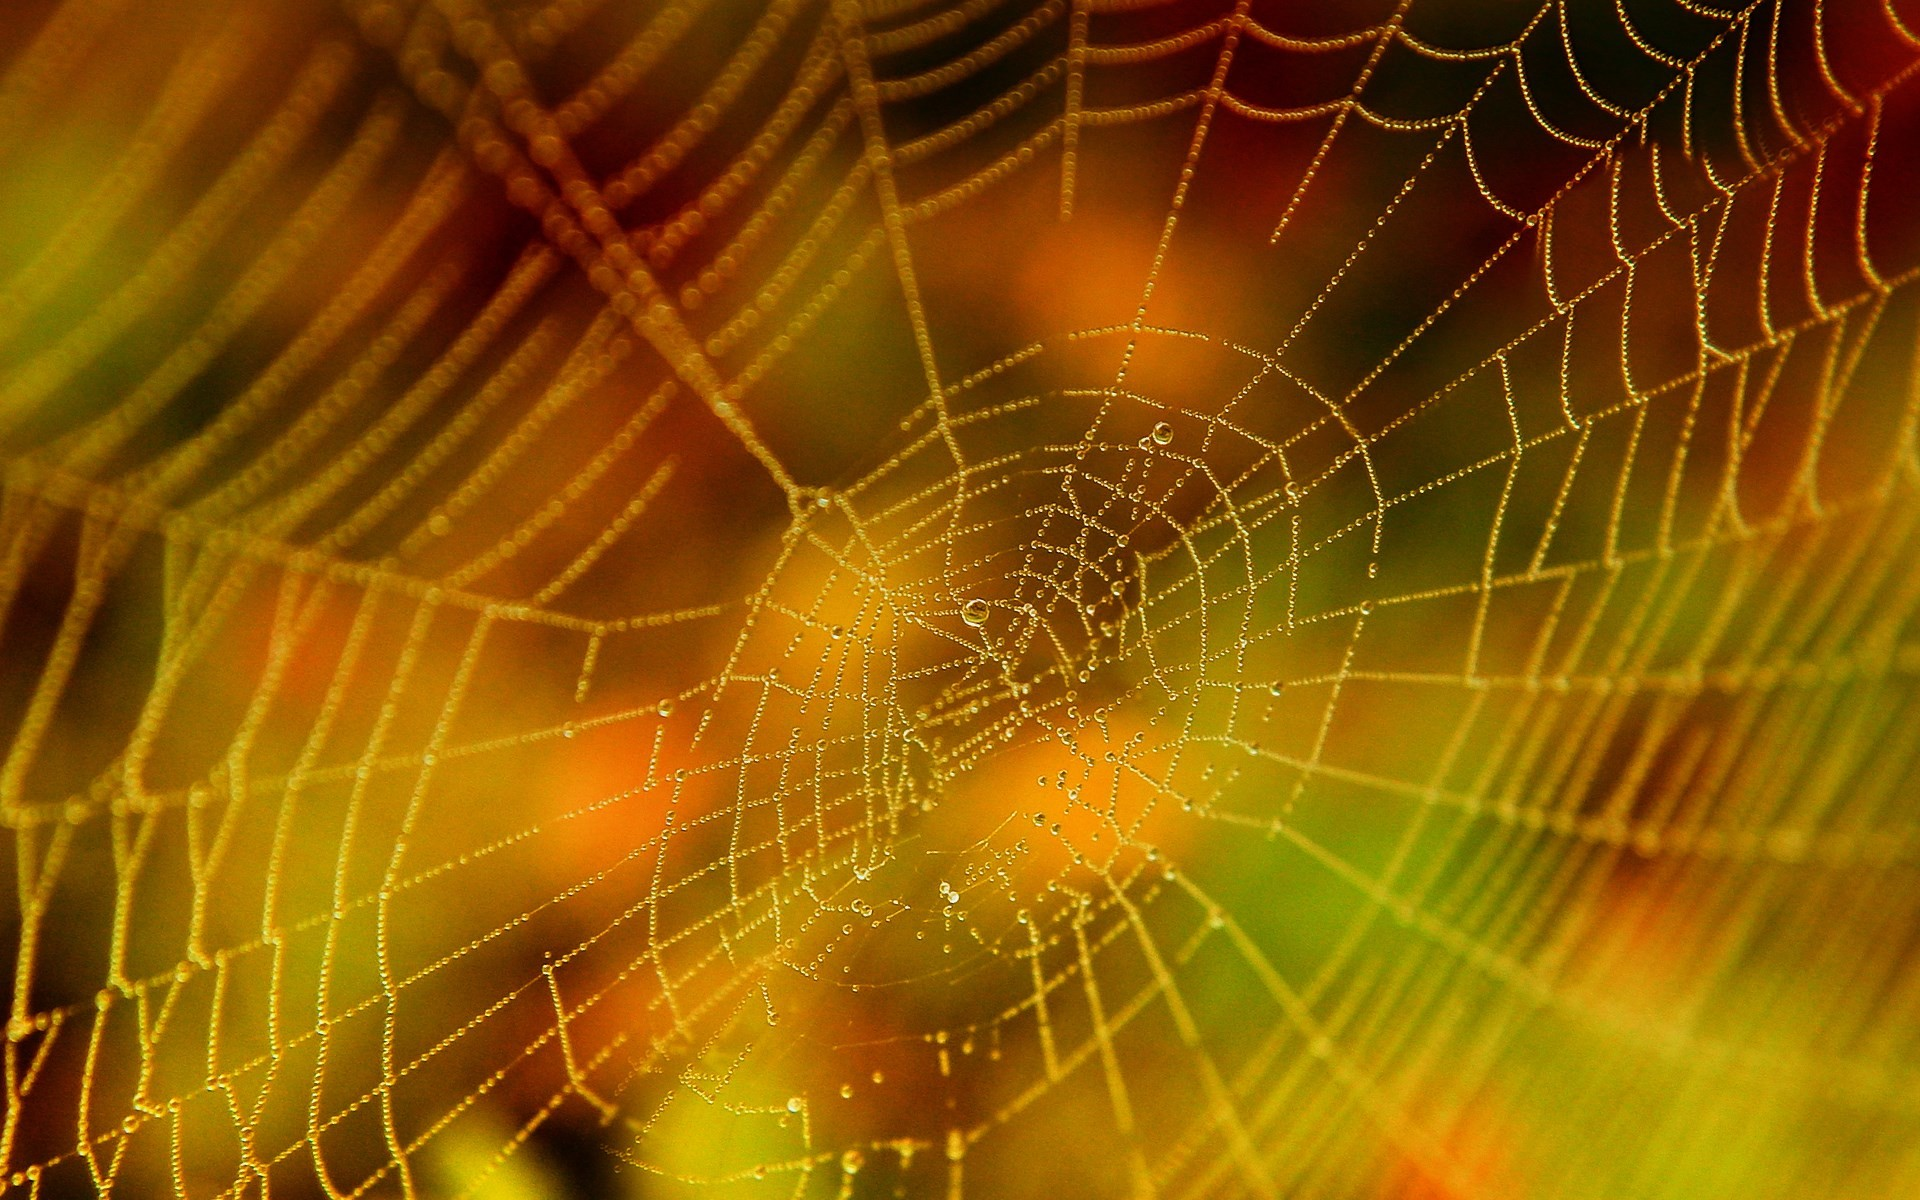 spider web wallpaper hd backgrounds images, (501 kB)